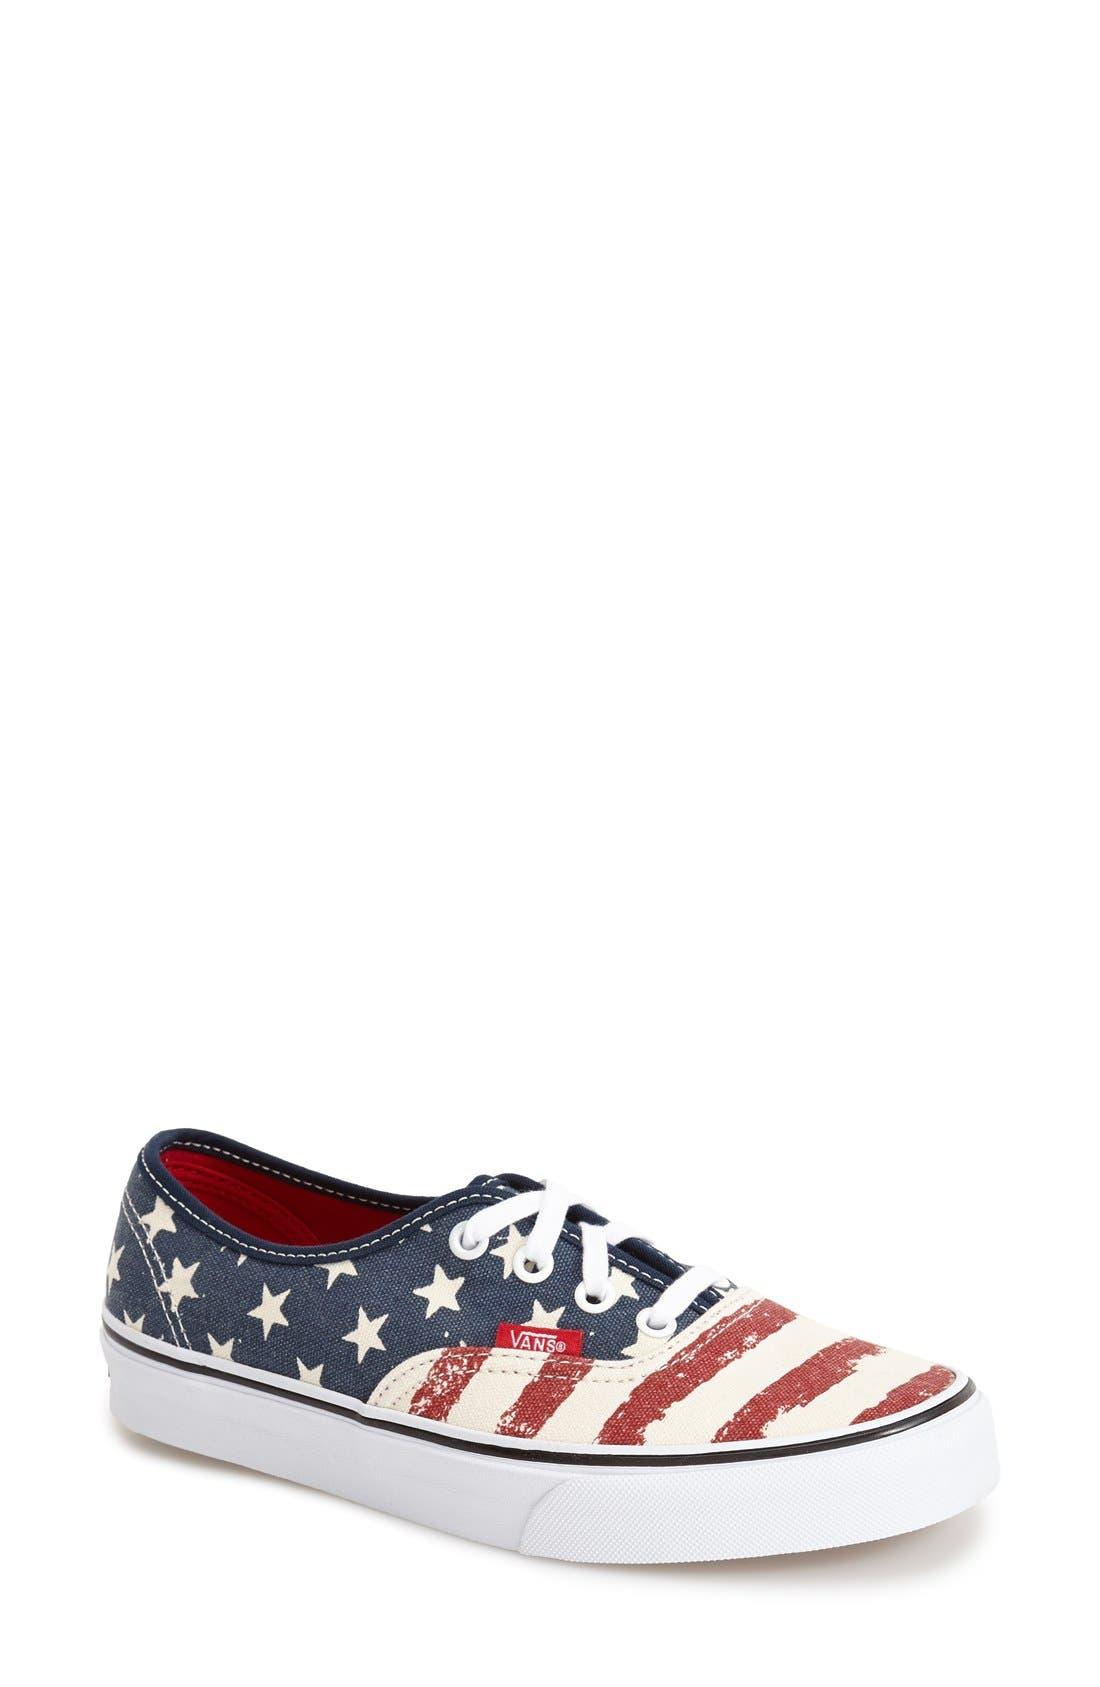 Alternate Image 1 Selected - Vans 'Authentic - Stars & Stripes' Sneaker (Women)